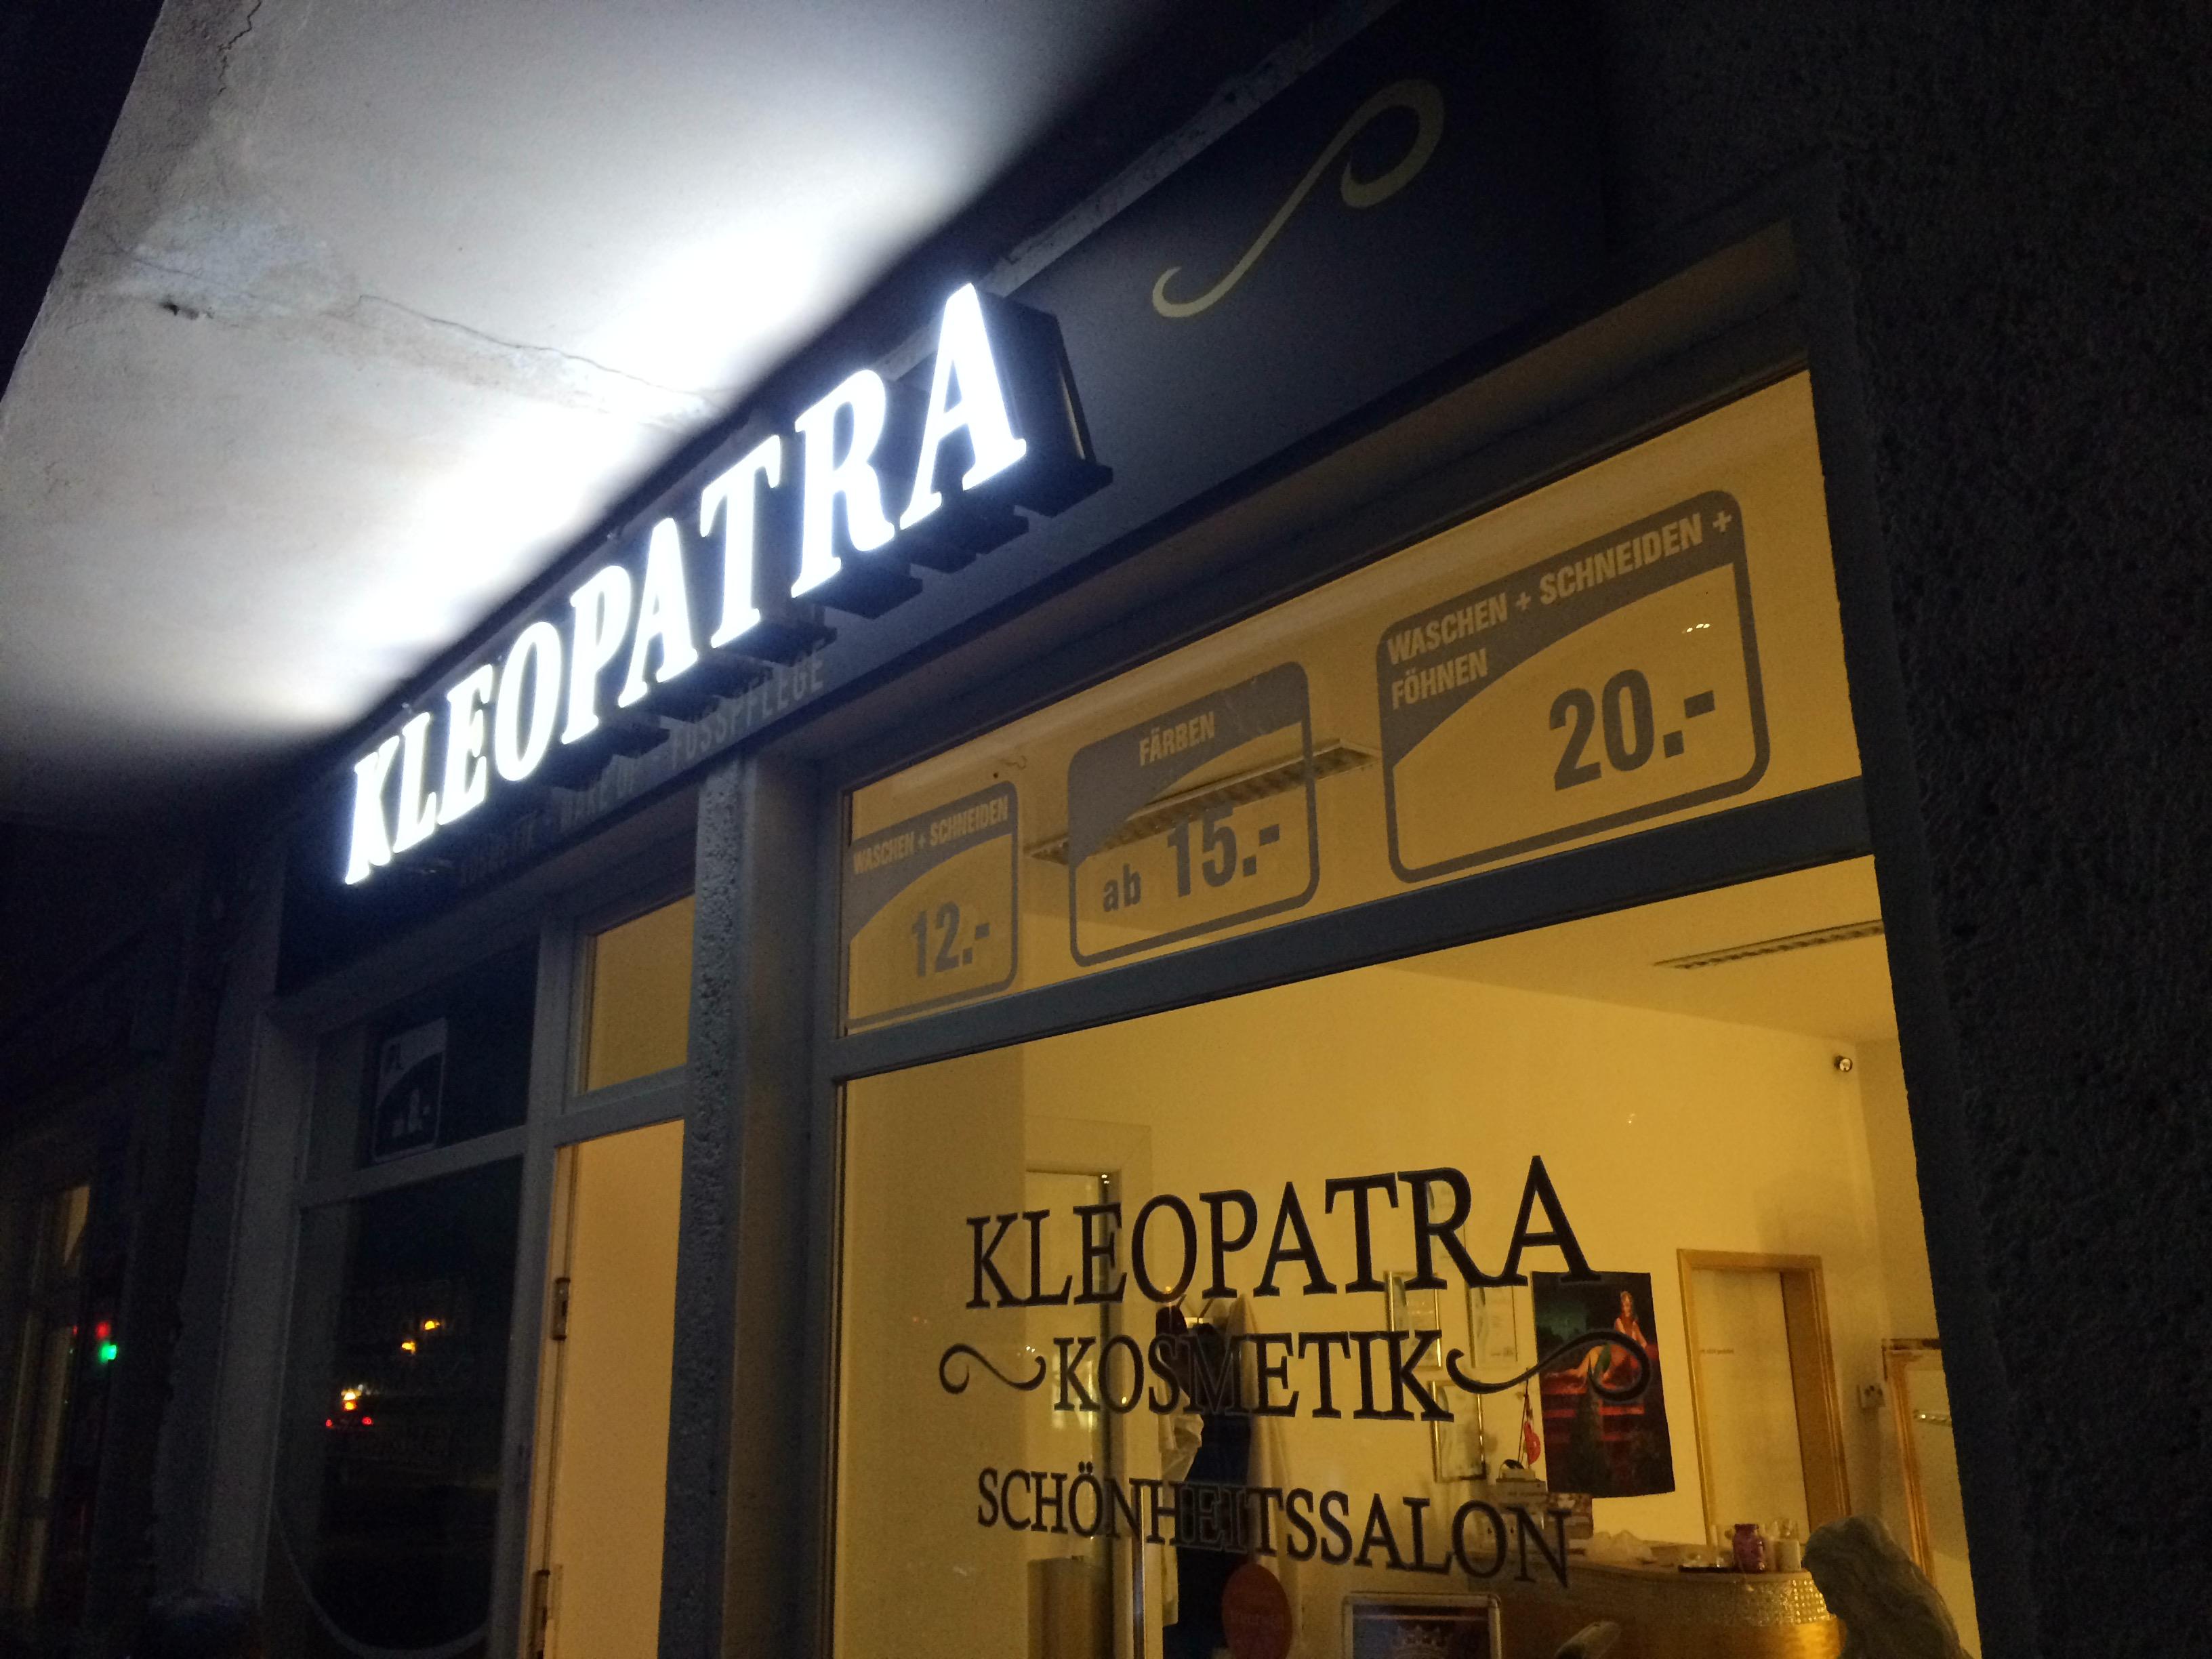 kleopatra Kosmetik Berlin Außenwerbung